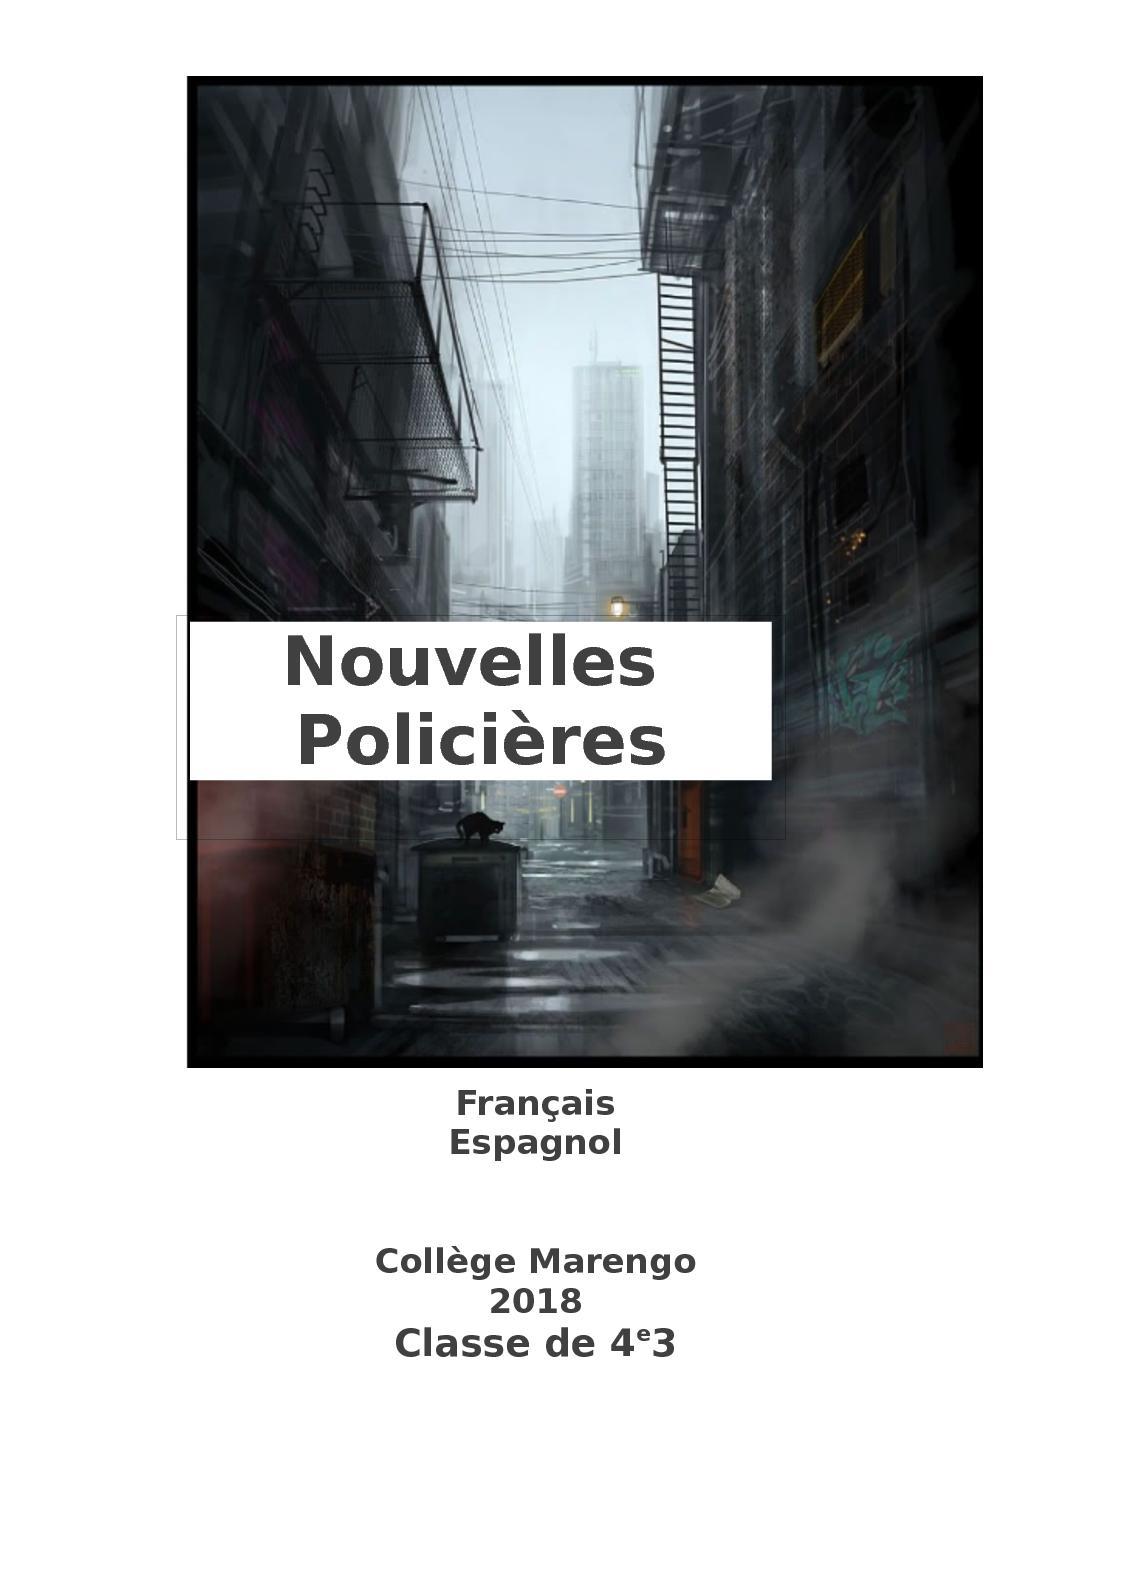 Calaméo - Nouvelles Policières Français Espagnol cf80edb02a36